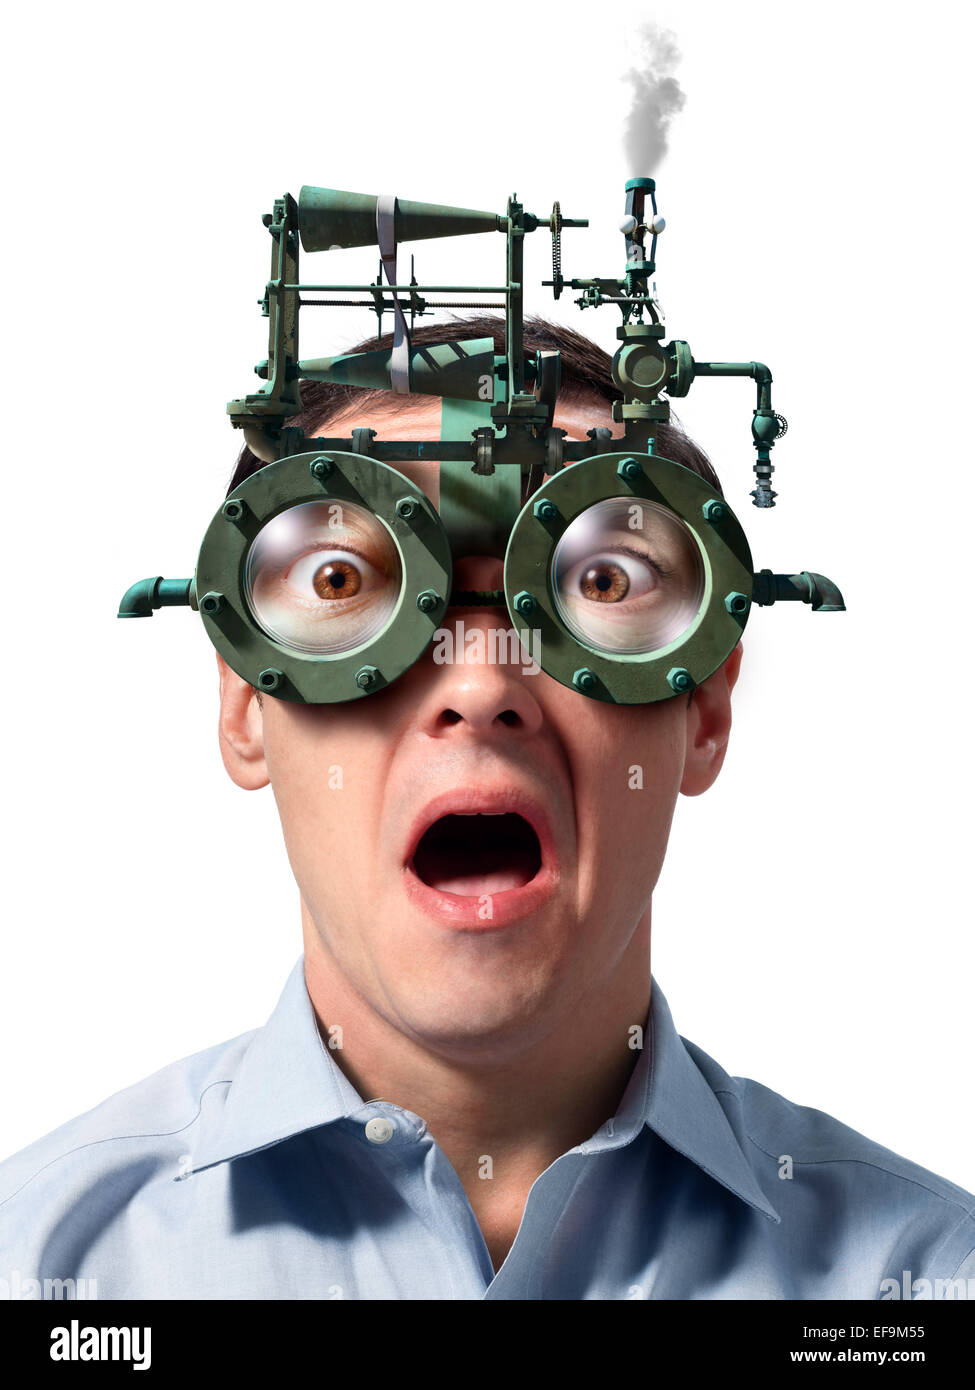 Fantasy image of man wearing steam powered eyeglasses - Stock Image